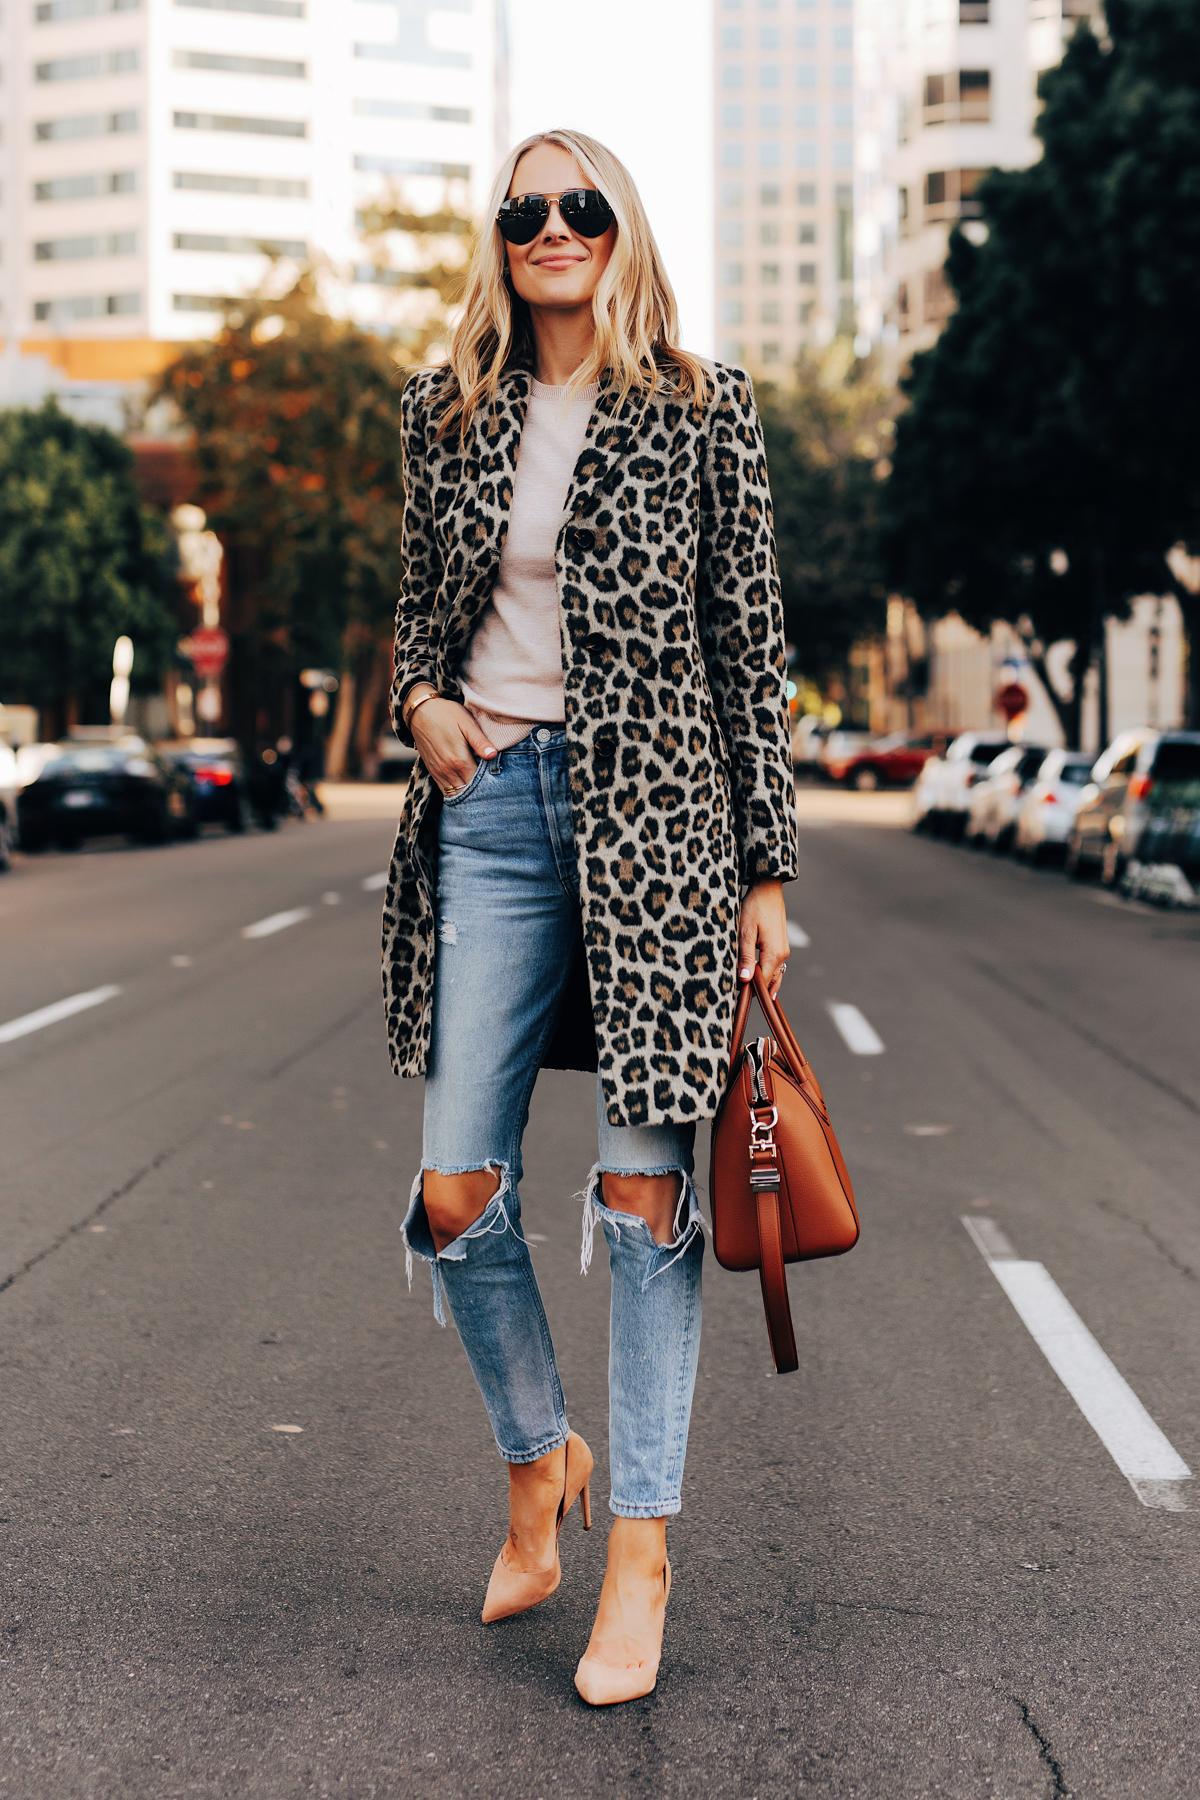 Fashion Jackson Wearing Ann Taylor Leopard Coat Ripped Jeans Nude Pumps Givenchy Antigona Cognac Satchel 1